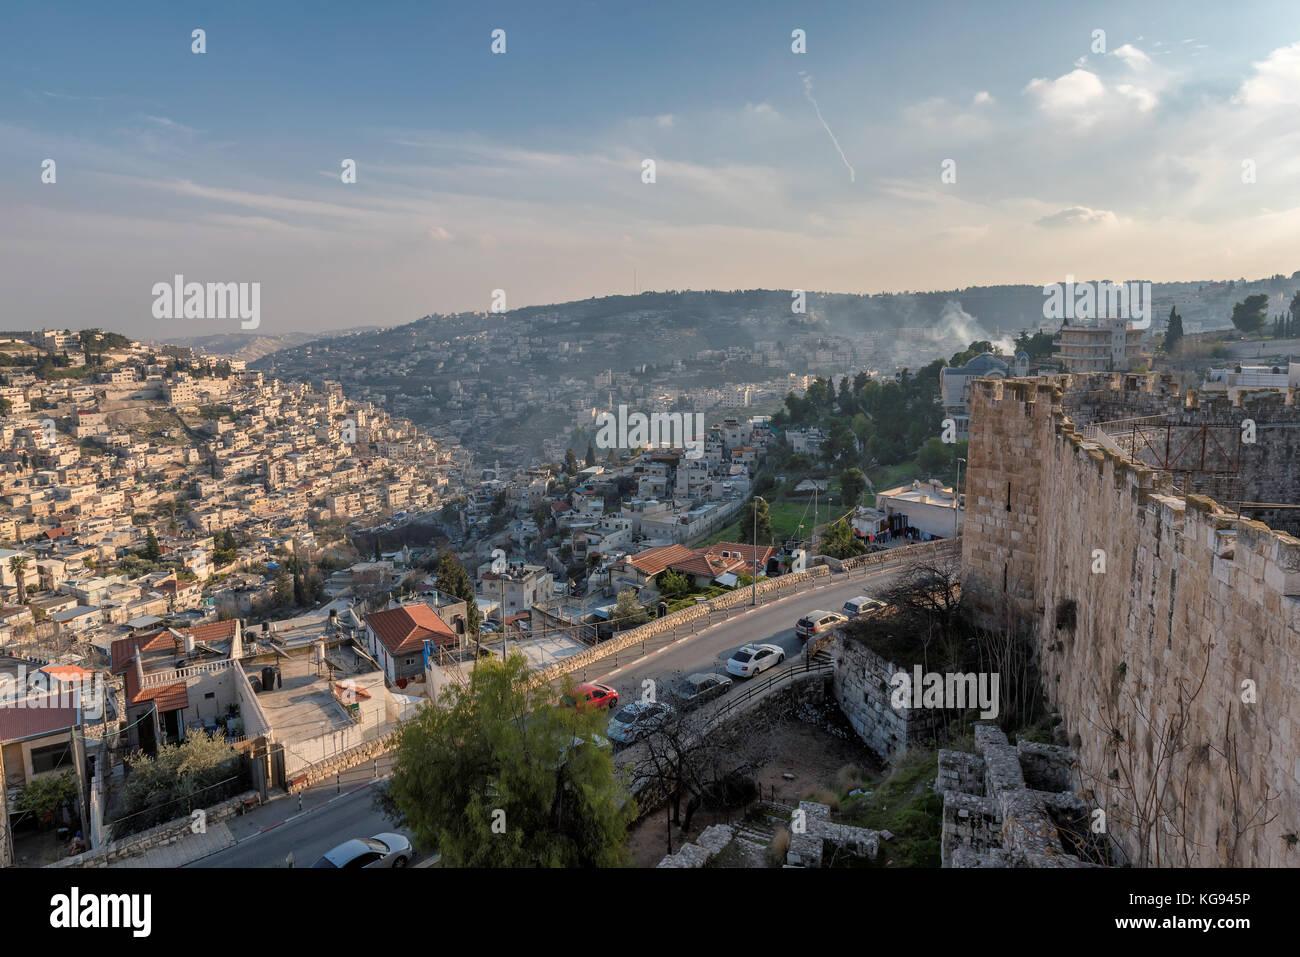 Jerusalem Old City, Israel. - Stock Image